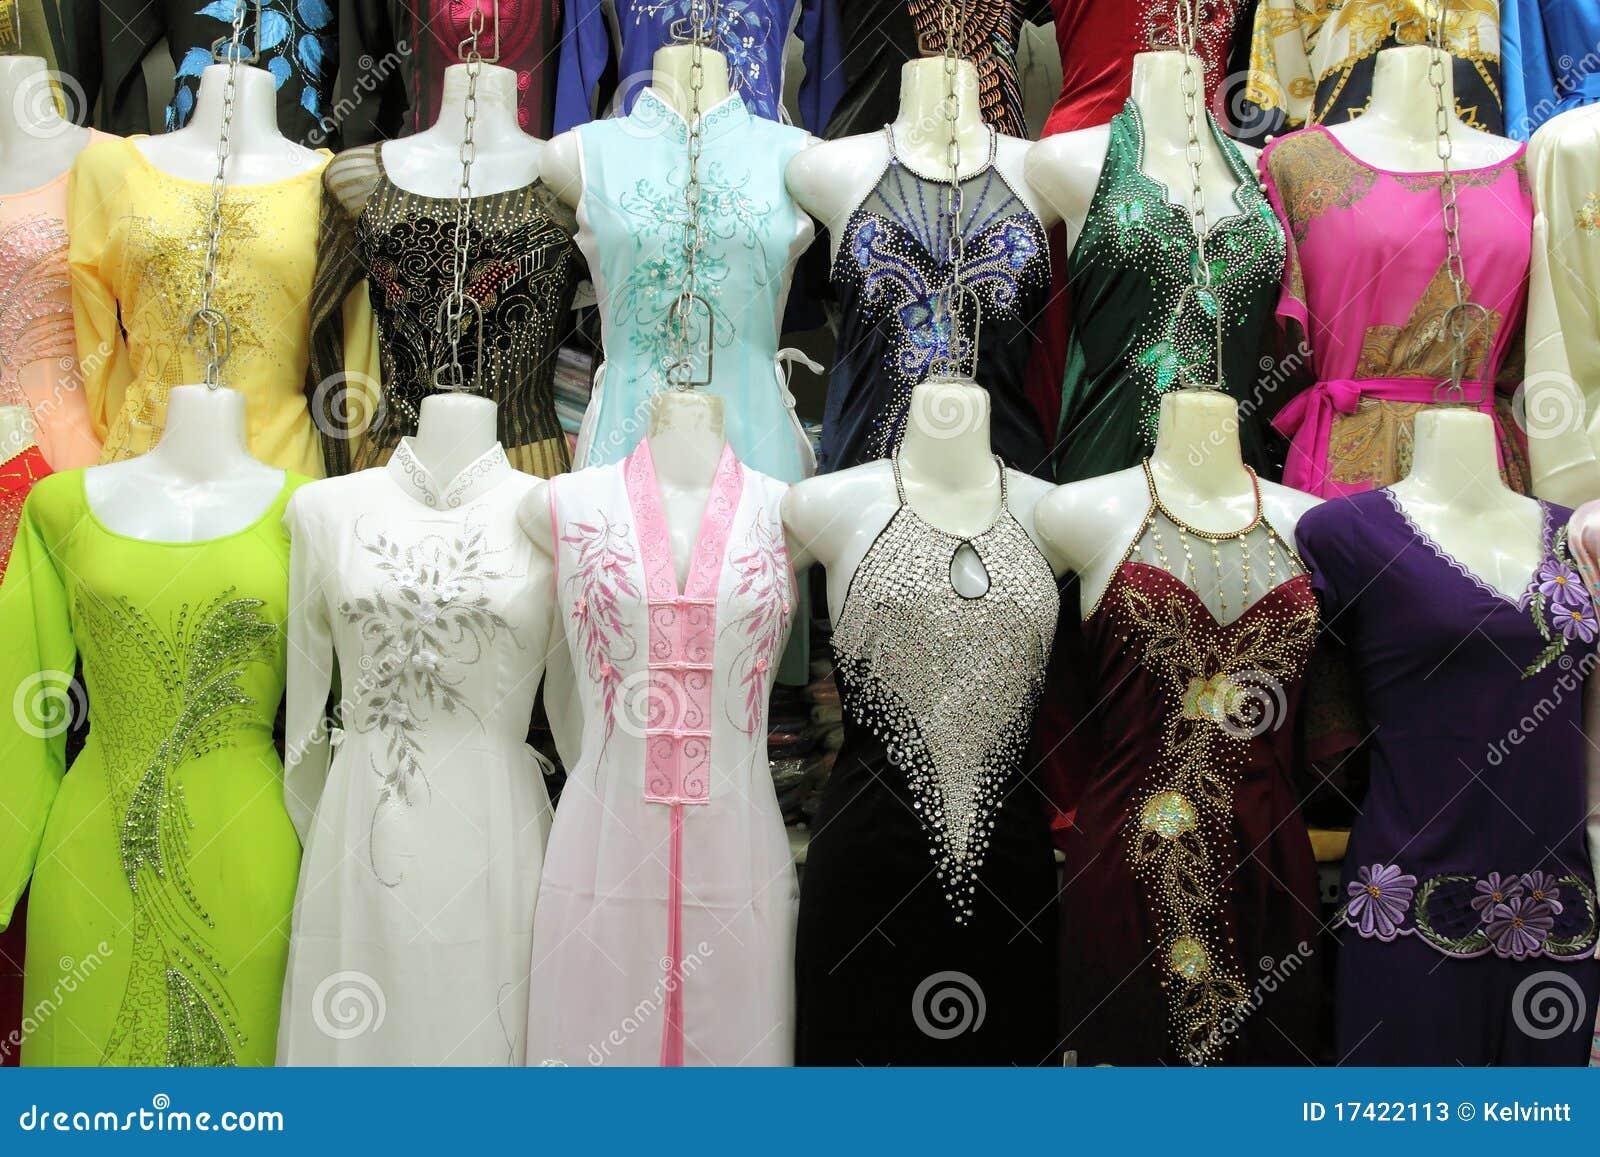 Silk Dresses for Sale at Market